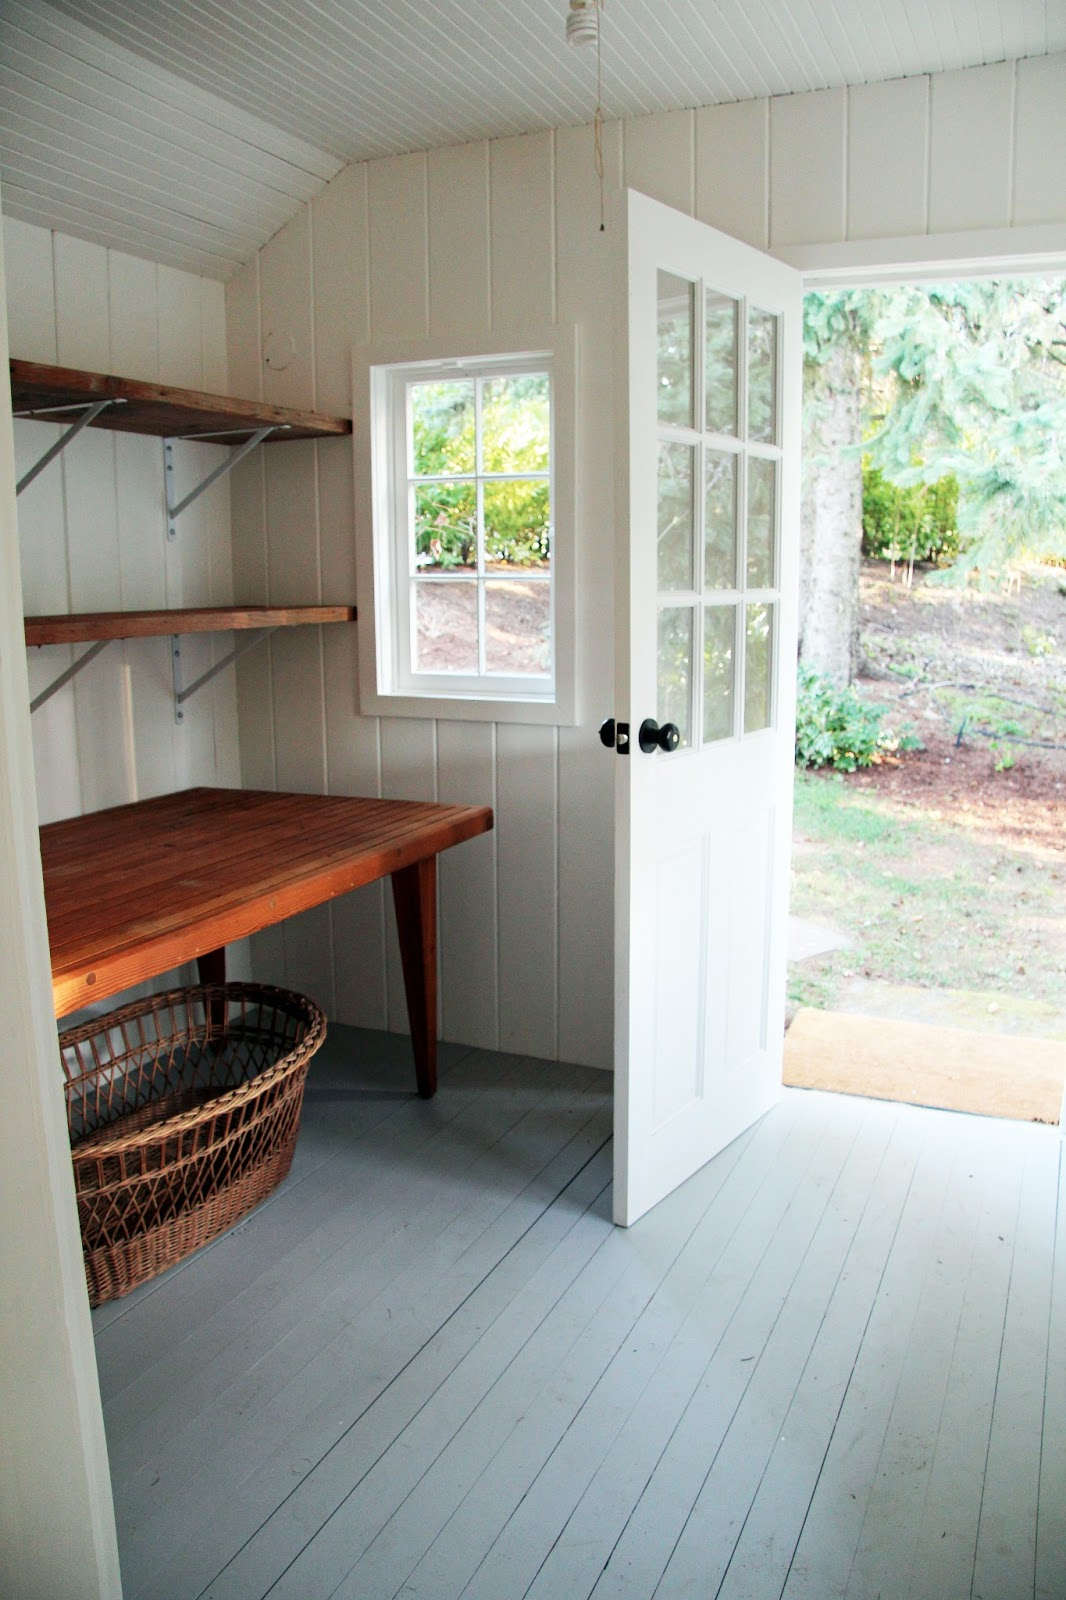 1600 #683C2B In The Fields : Sauna In Disrepair Turned Fitness Studio Final Look save image Simpson Fir Doors 41971066